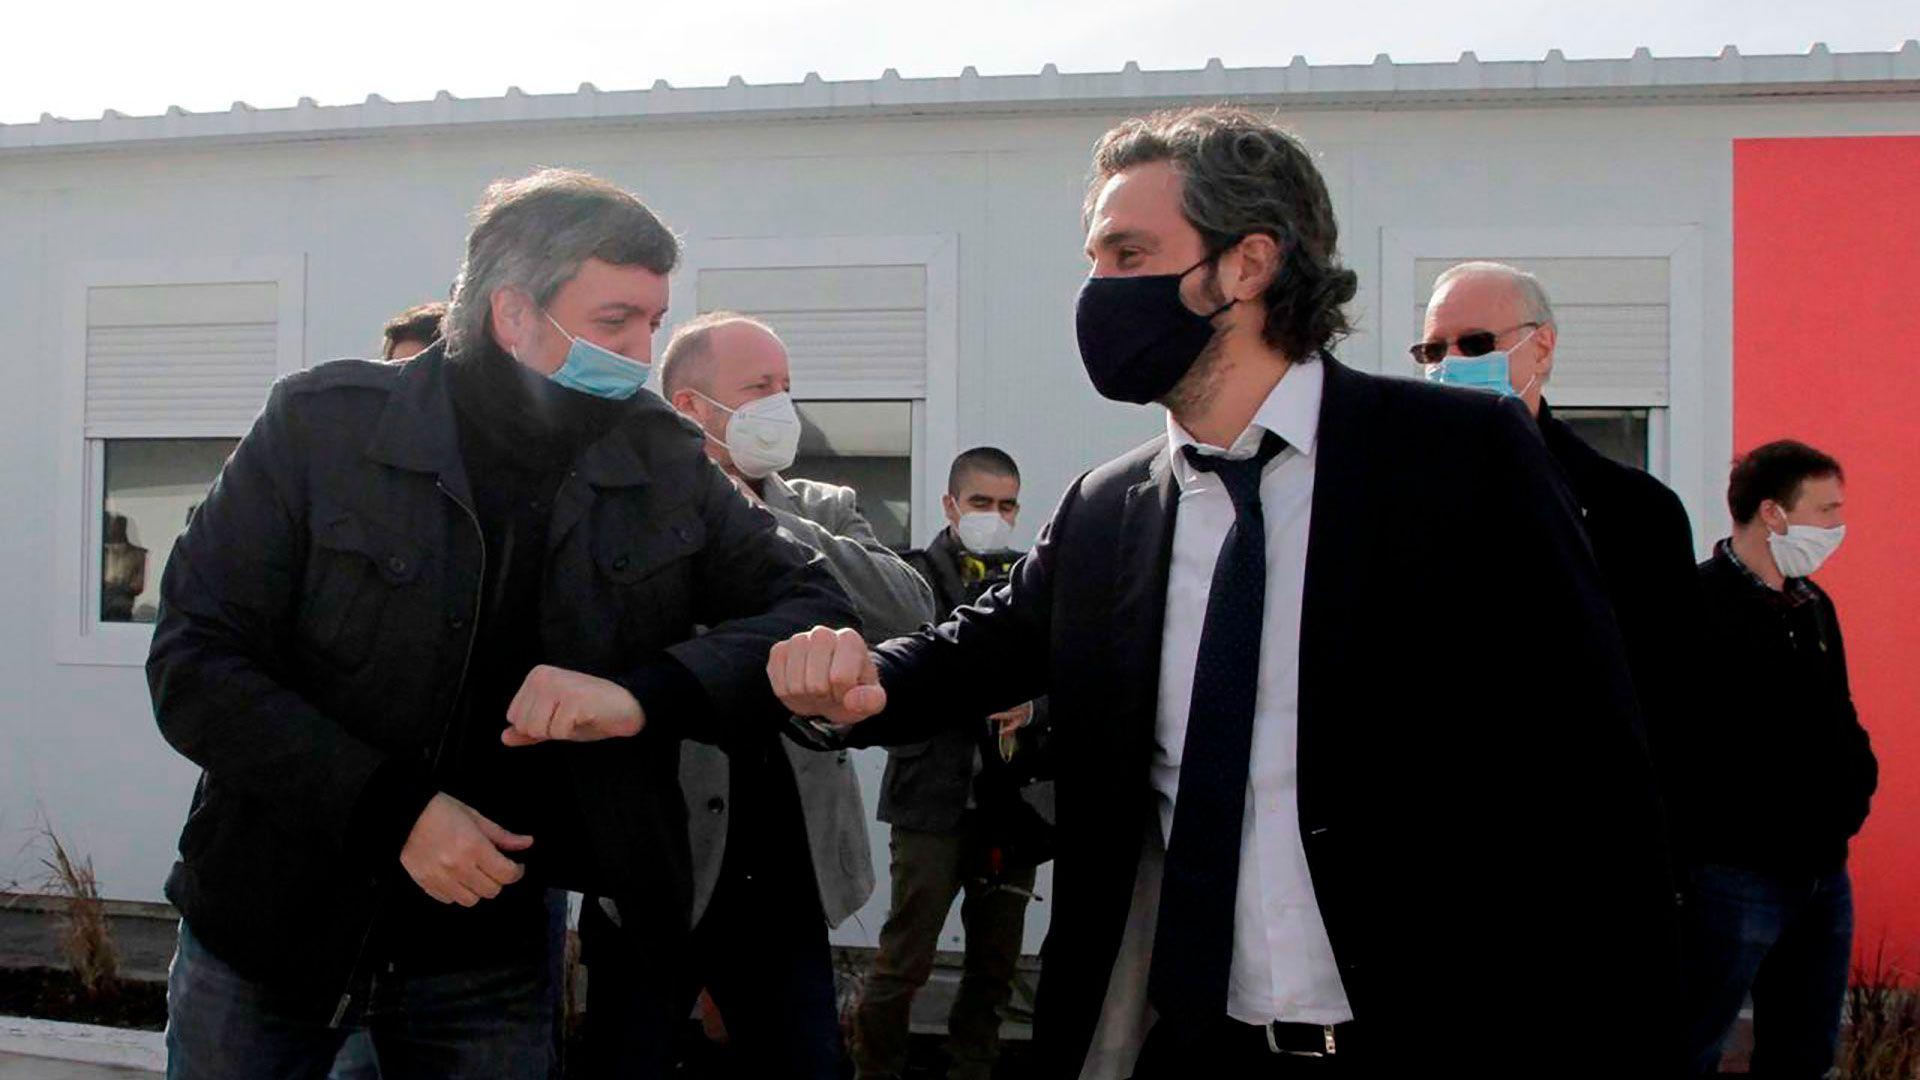 Santiago Cafiero y Maximo Kirchner saludo codo barbijo